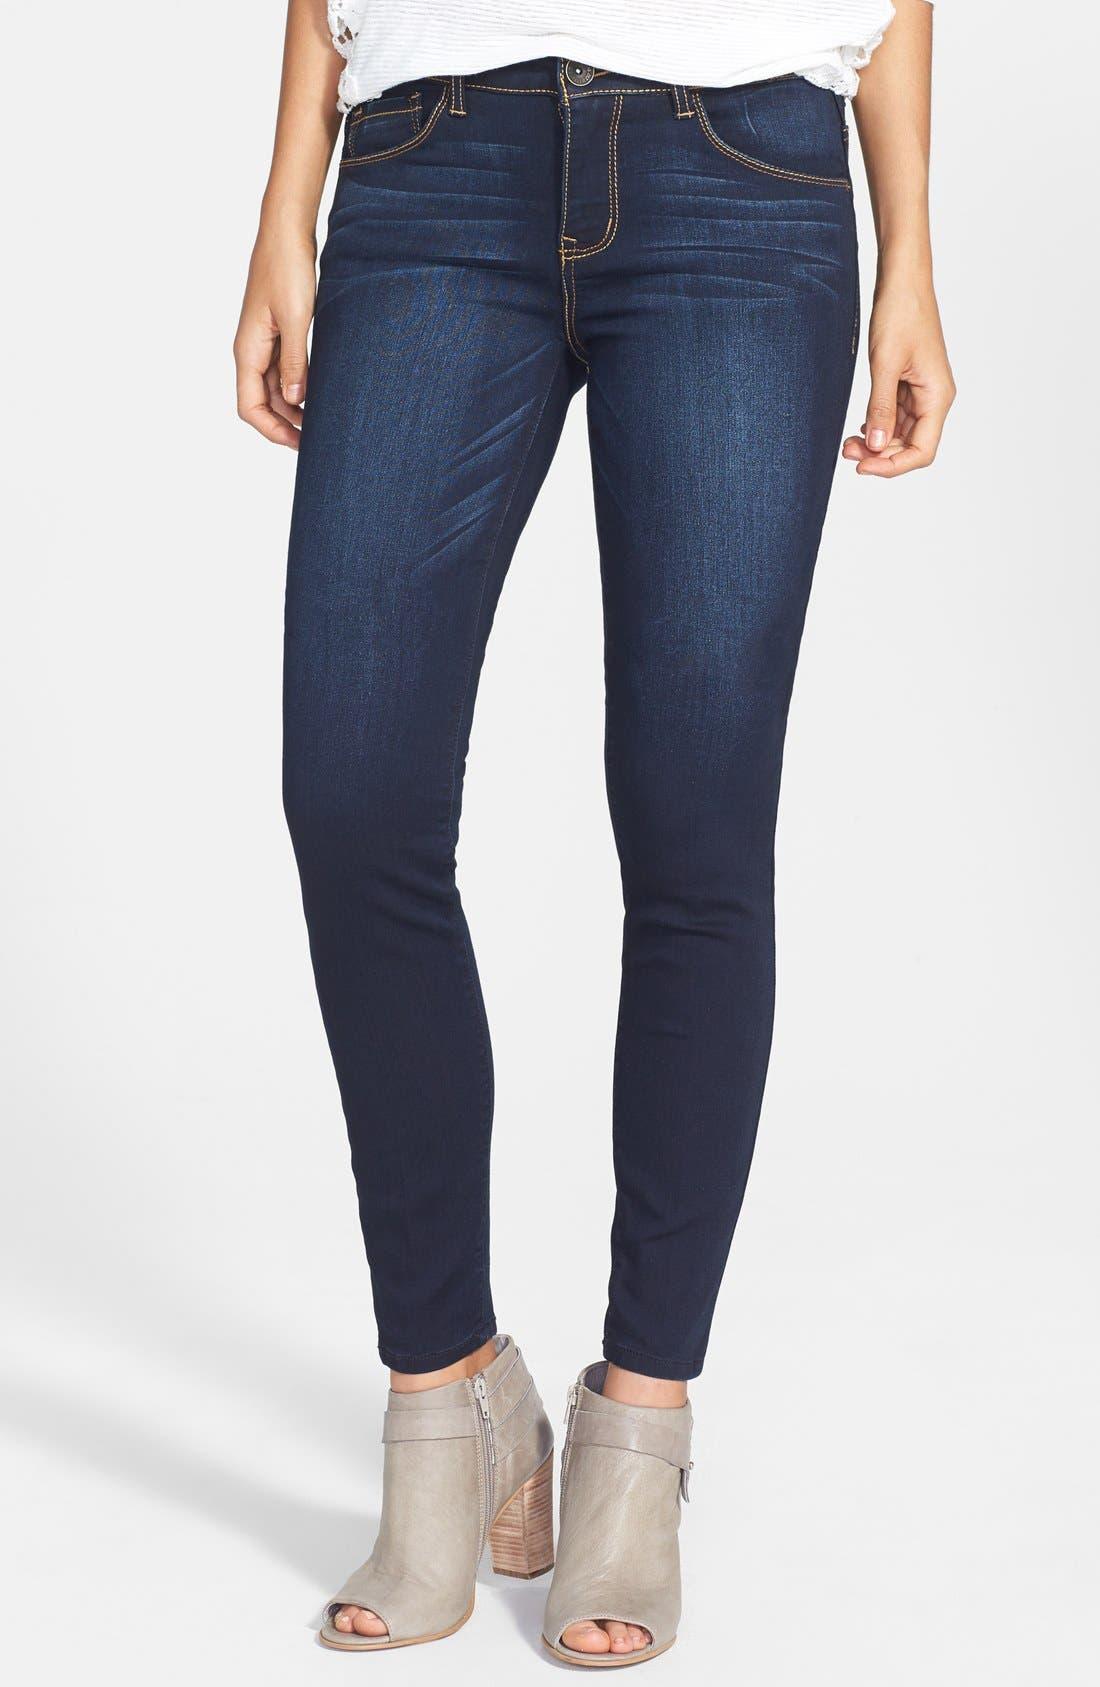 Alternate Image 1 Selected - Jolt Stretch Skinny Jeans (Online Only)